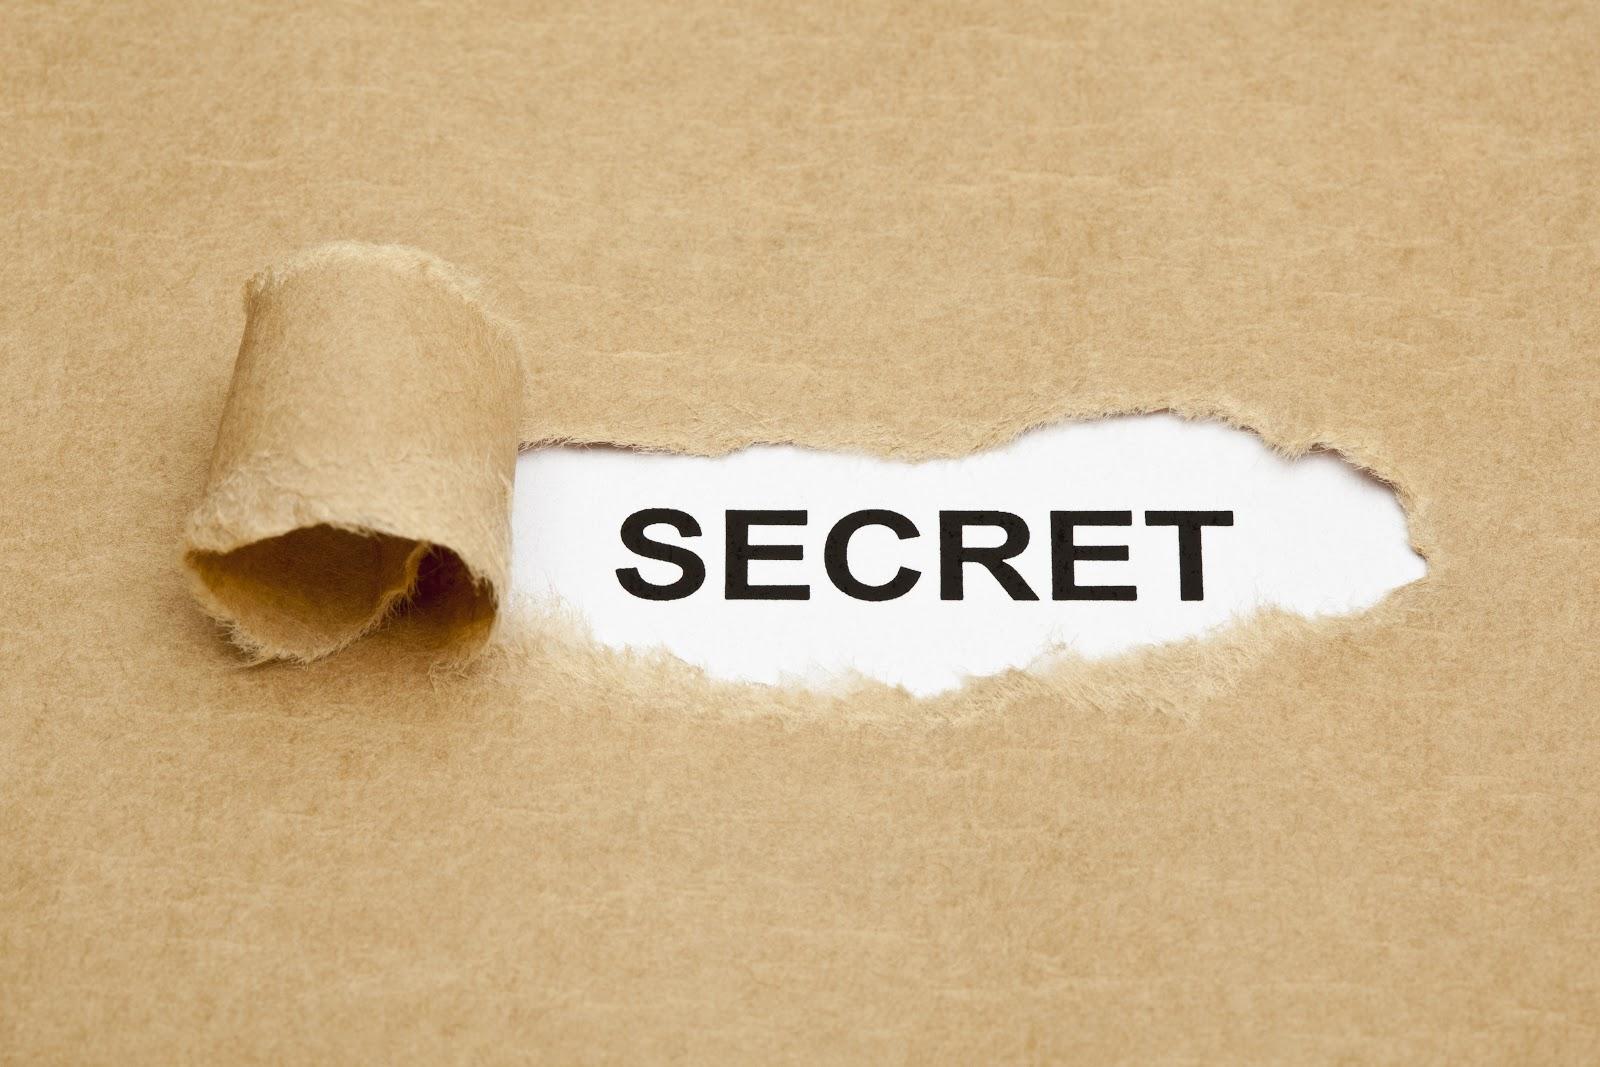 Secret AdobeStock 54511984